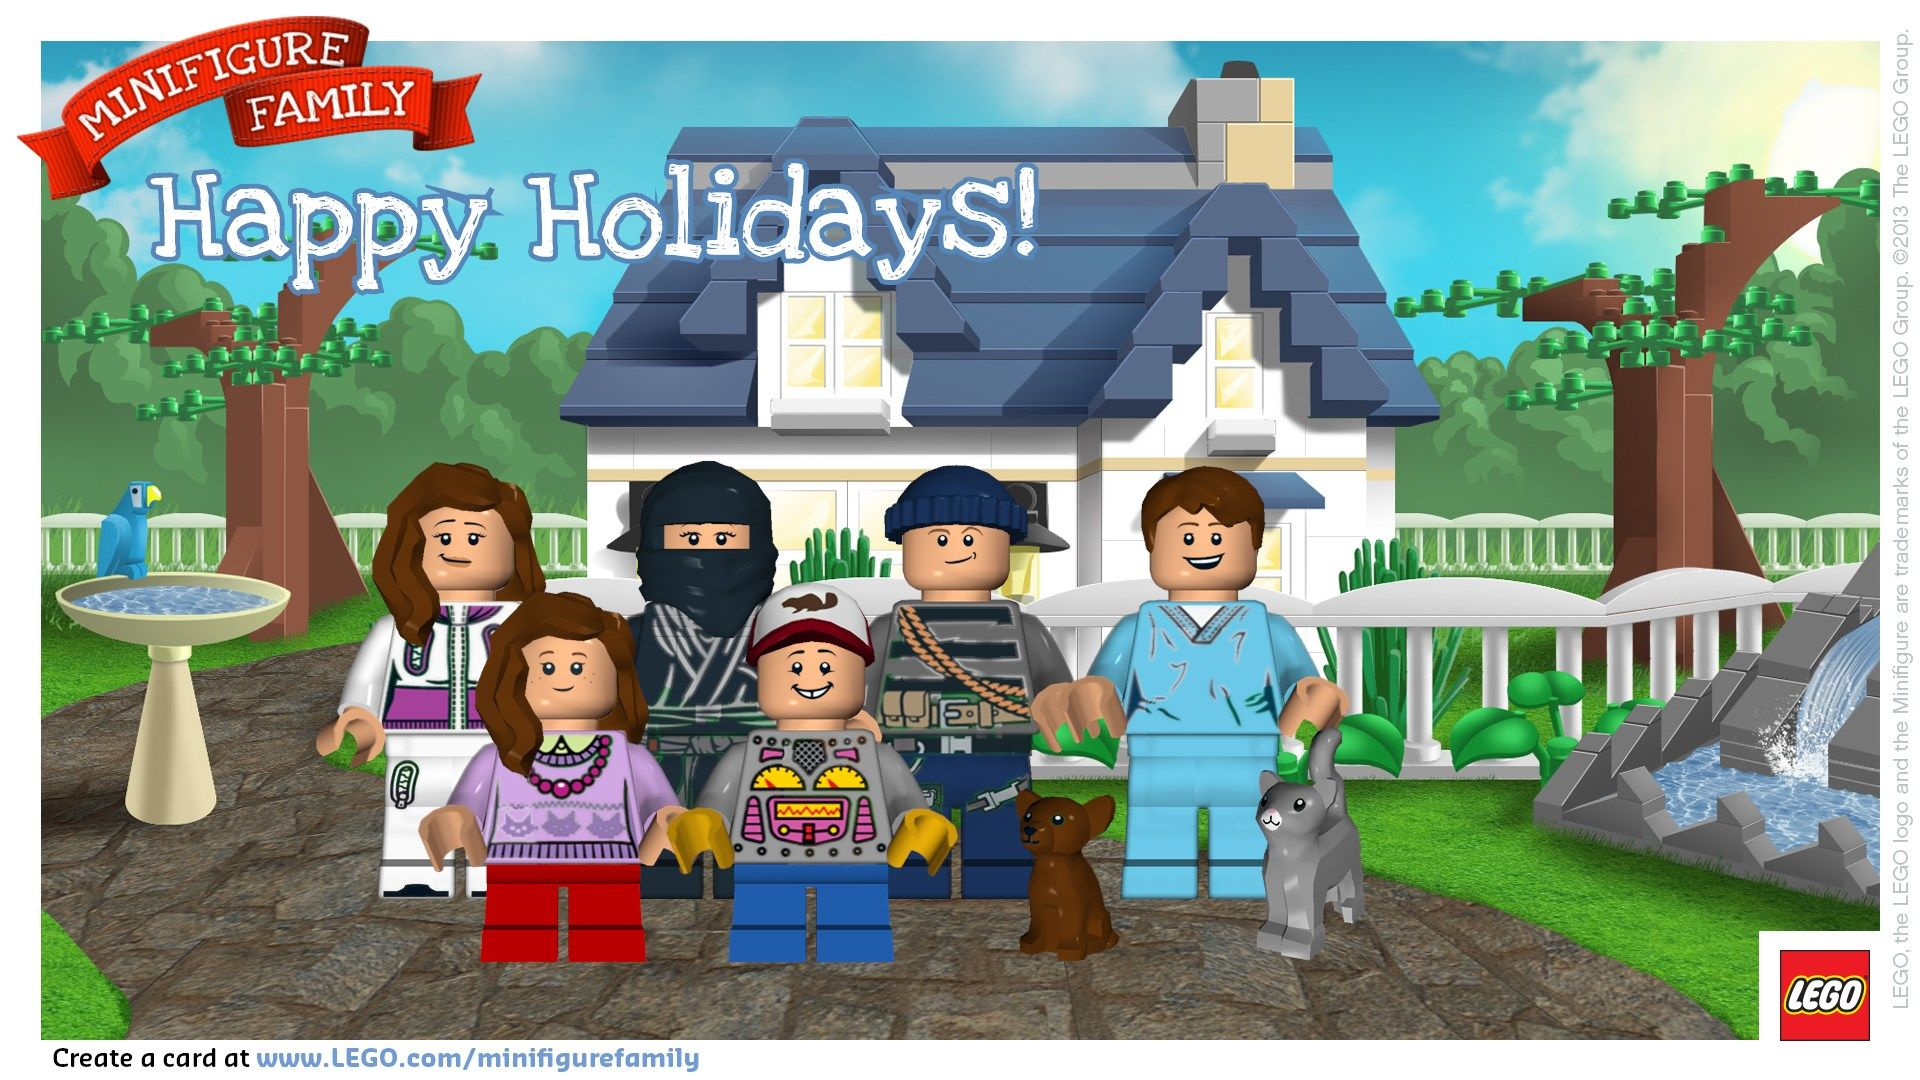 LEGO Minifigure Family Holiday Card | Christmas | Pinterest | Lego ...